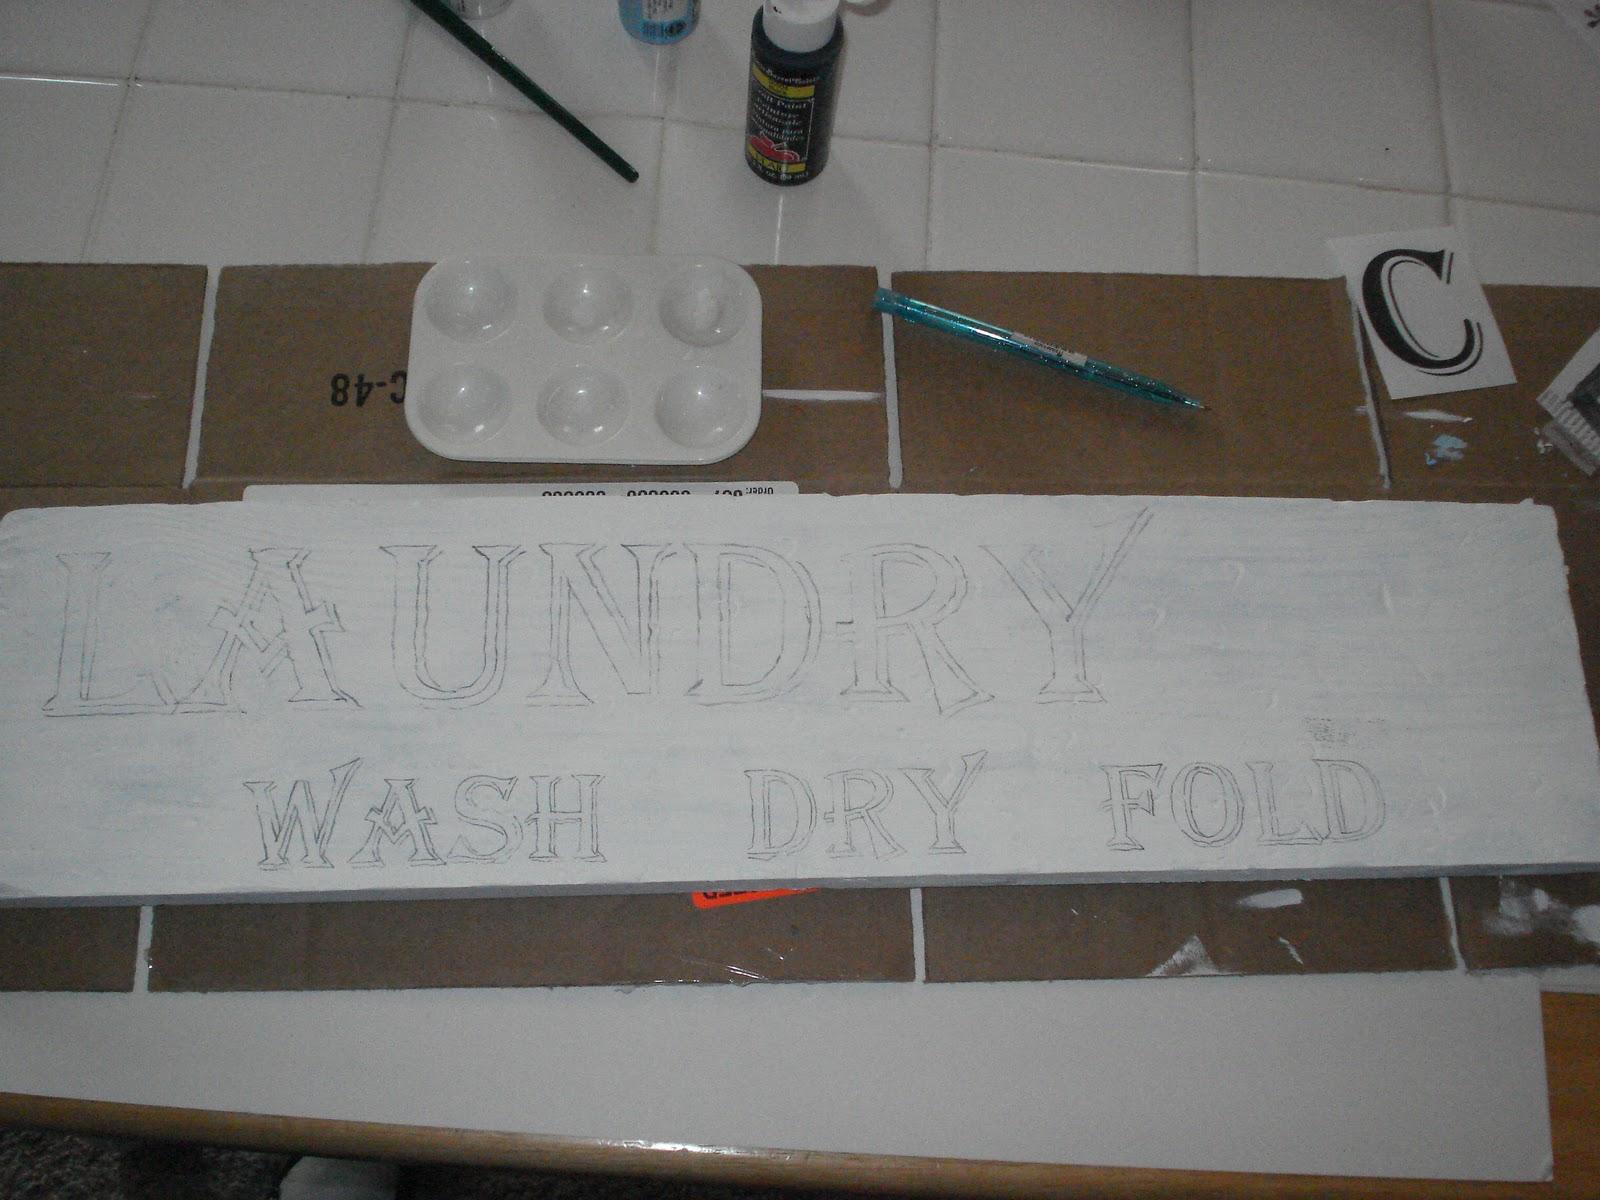 http://3.bp.blogspot.com/_-MioPdTUS-k/TS28rQudnsI/AAAAAAAAAic/HrrtdSa_NSE/s1600/snow+%2526+laundry+sign+012.JPG